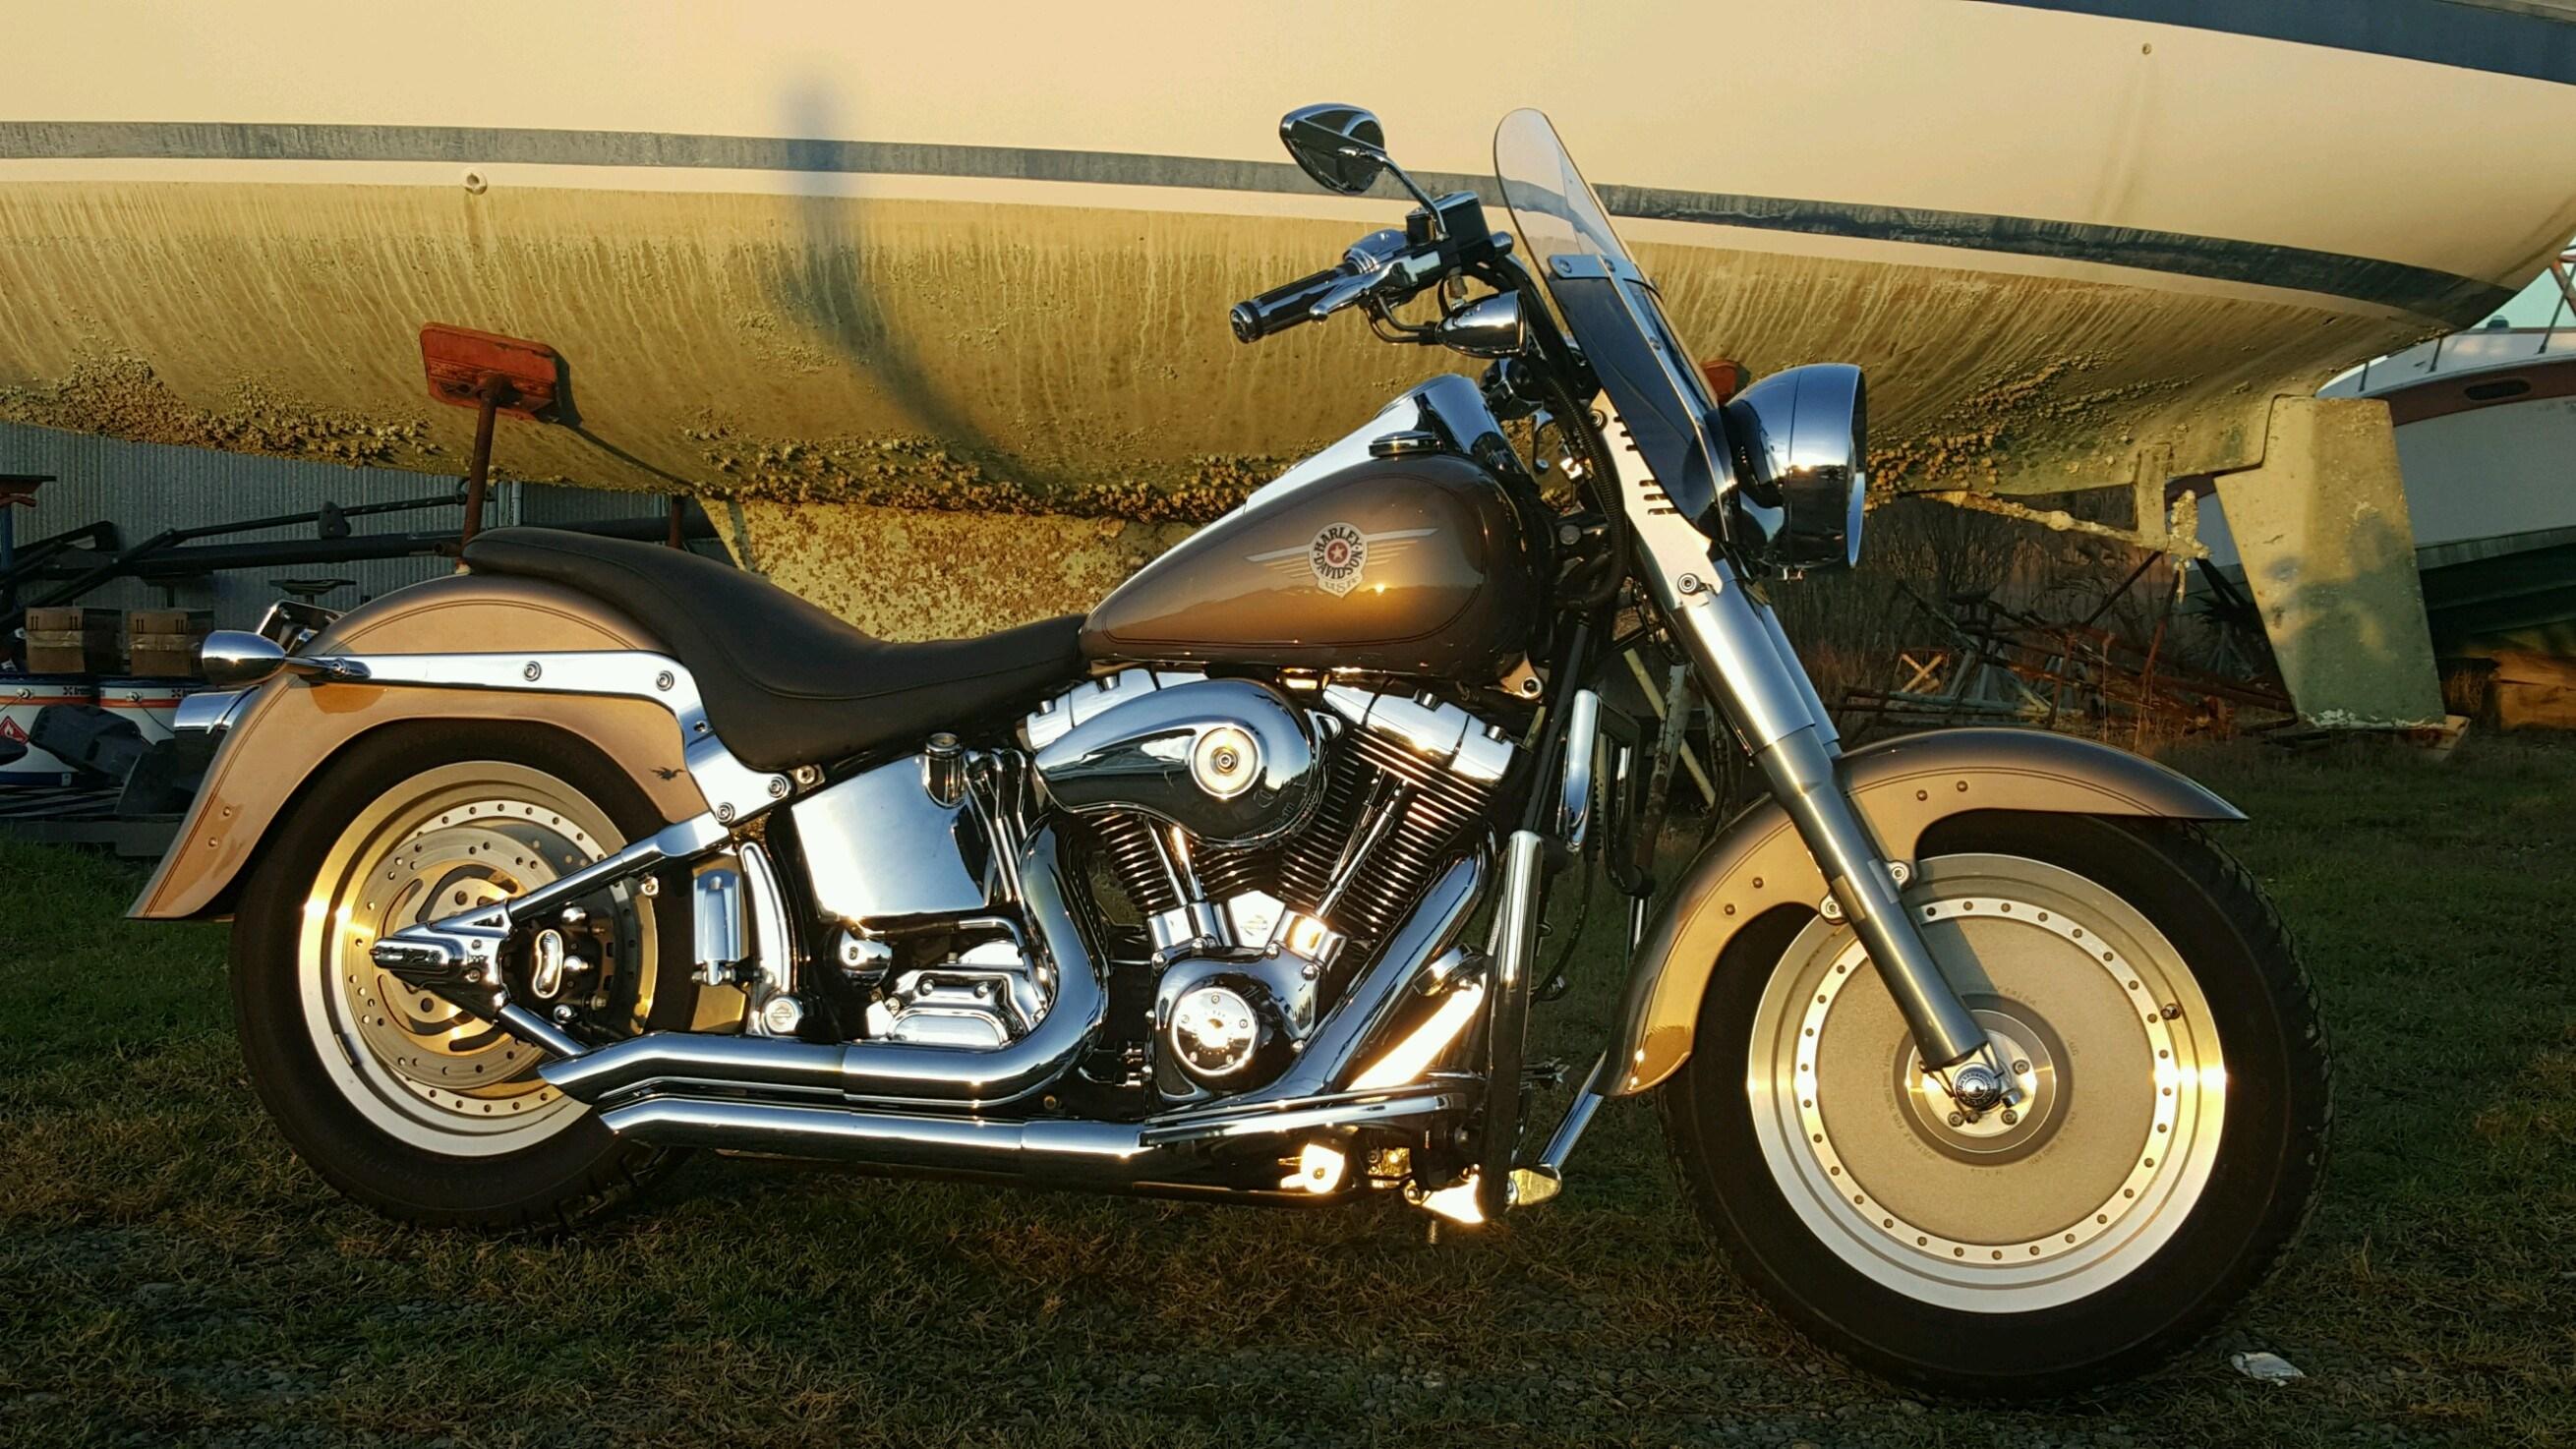 Motorcycle Dealer Orlando Fl >> 2004 Harley-Davidson® FLSTF/I Softail® Fat Boy® (Smokey Gold in color,), charlotte, North ...